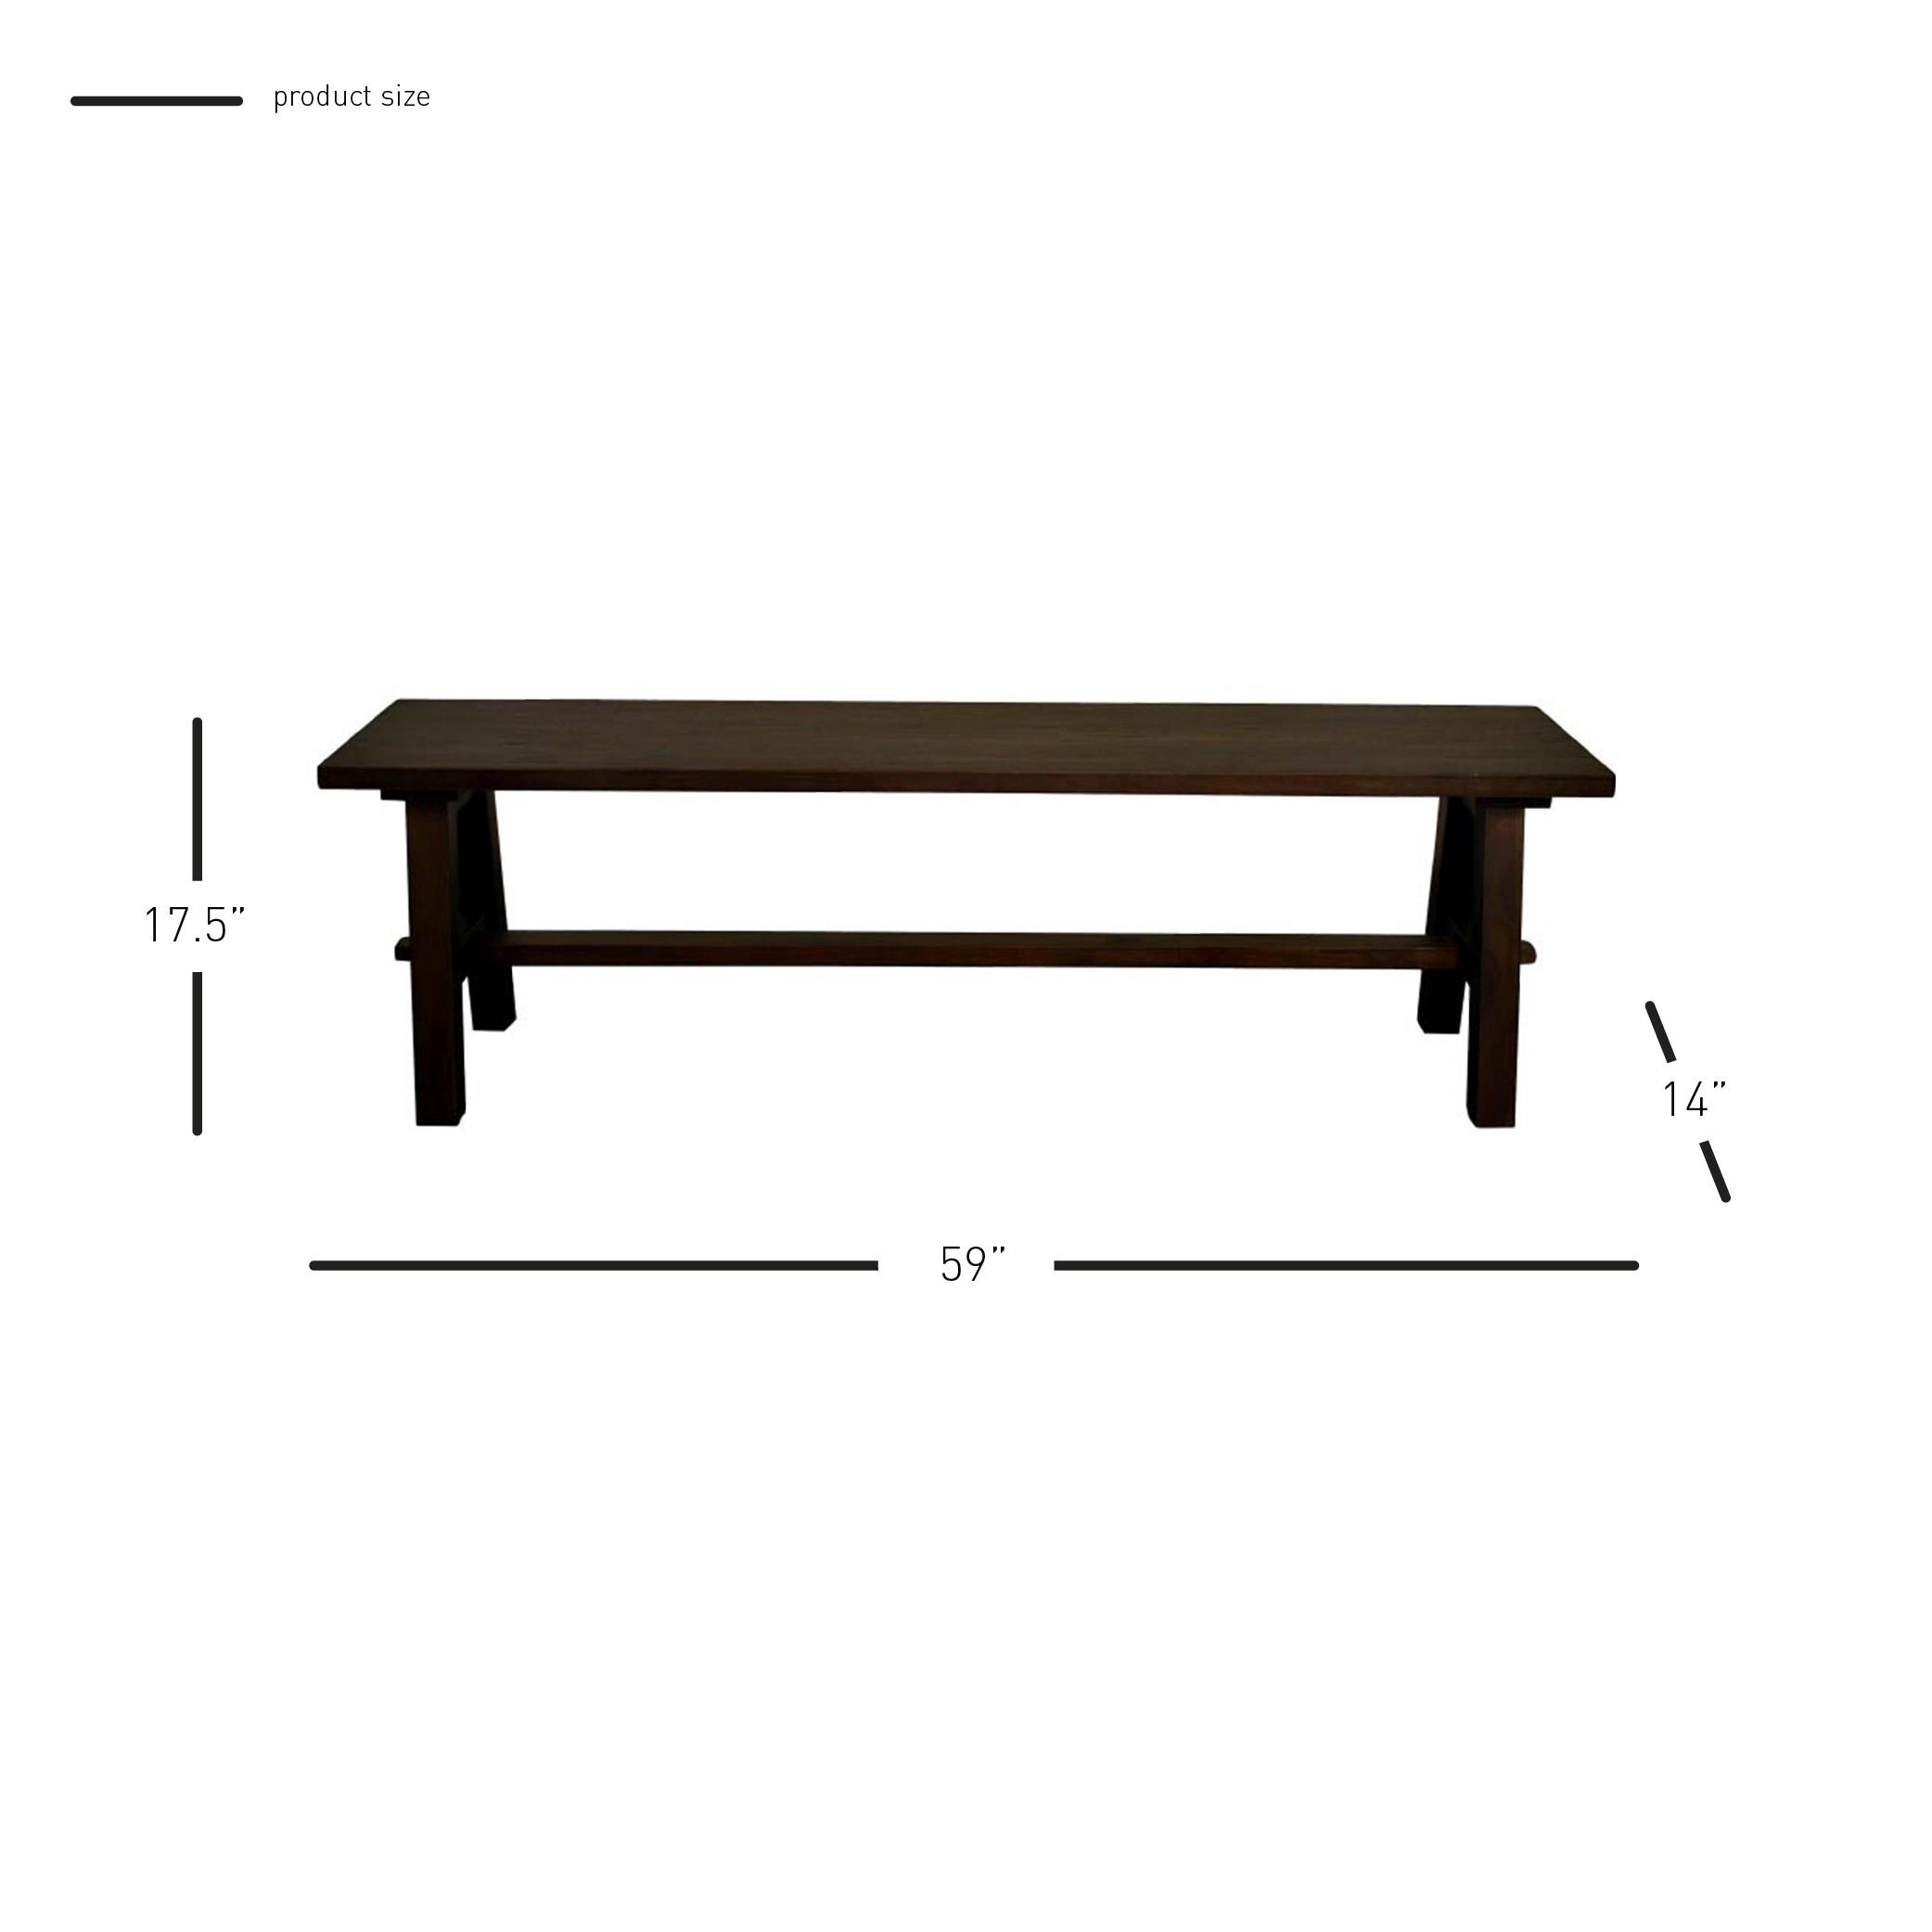 803018 157 Npd Home Furniture Wholesale Lifestyle